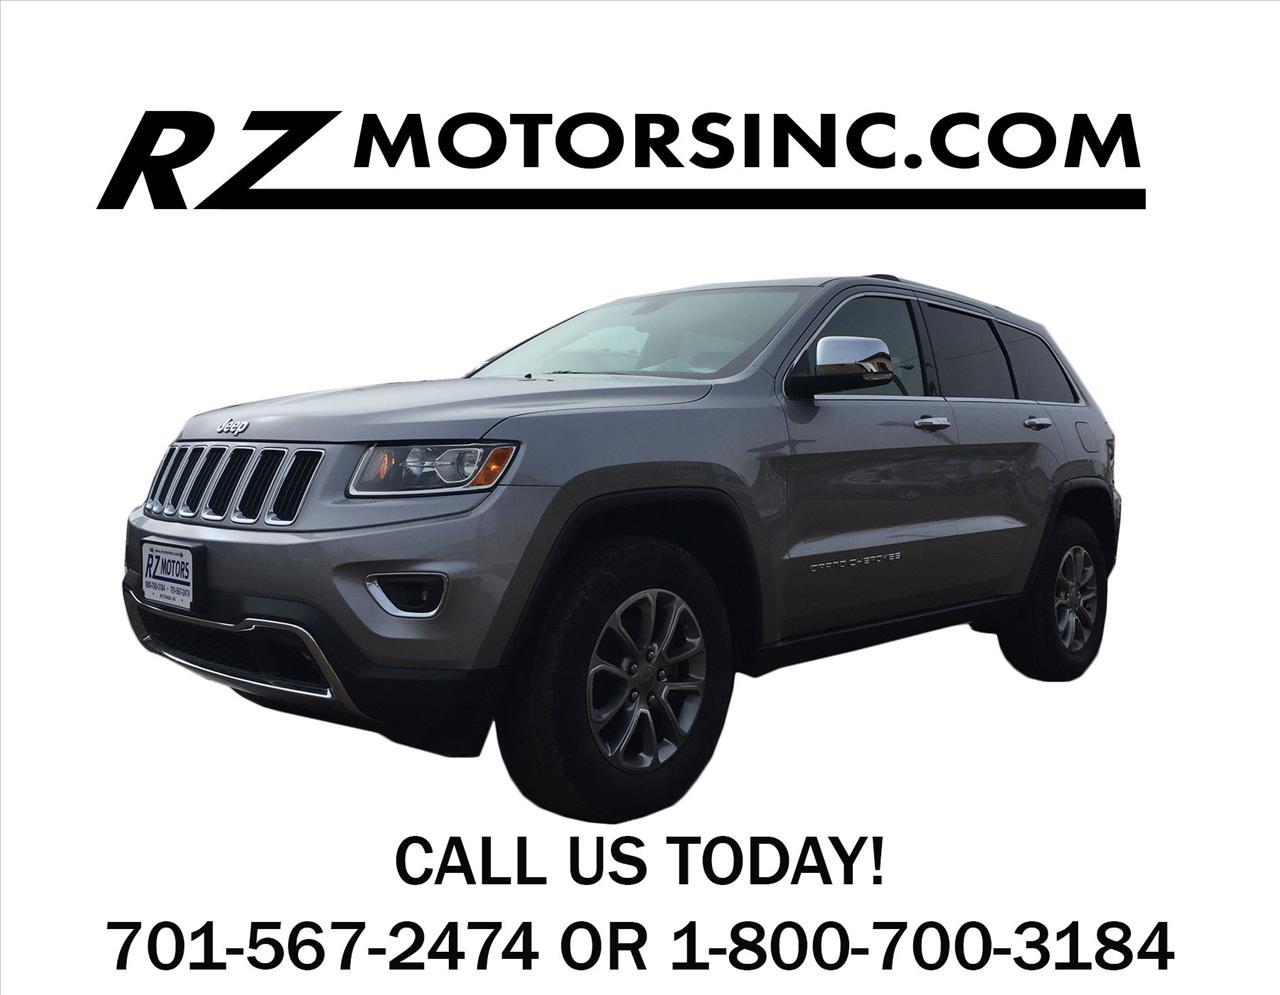 2014 jeep grand cherokee limited 4x4 4dr suv in hettinger for Rz motors inc hettinger nd